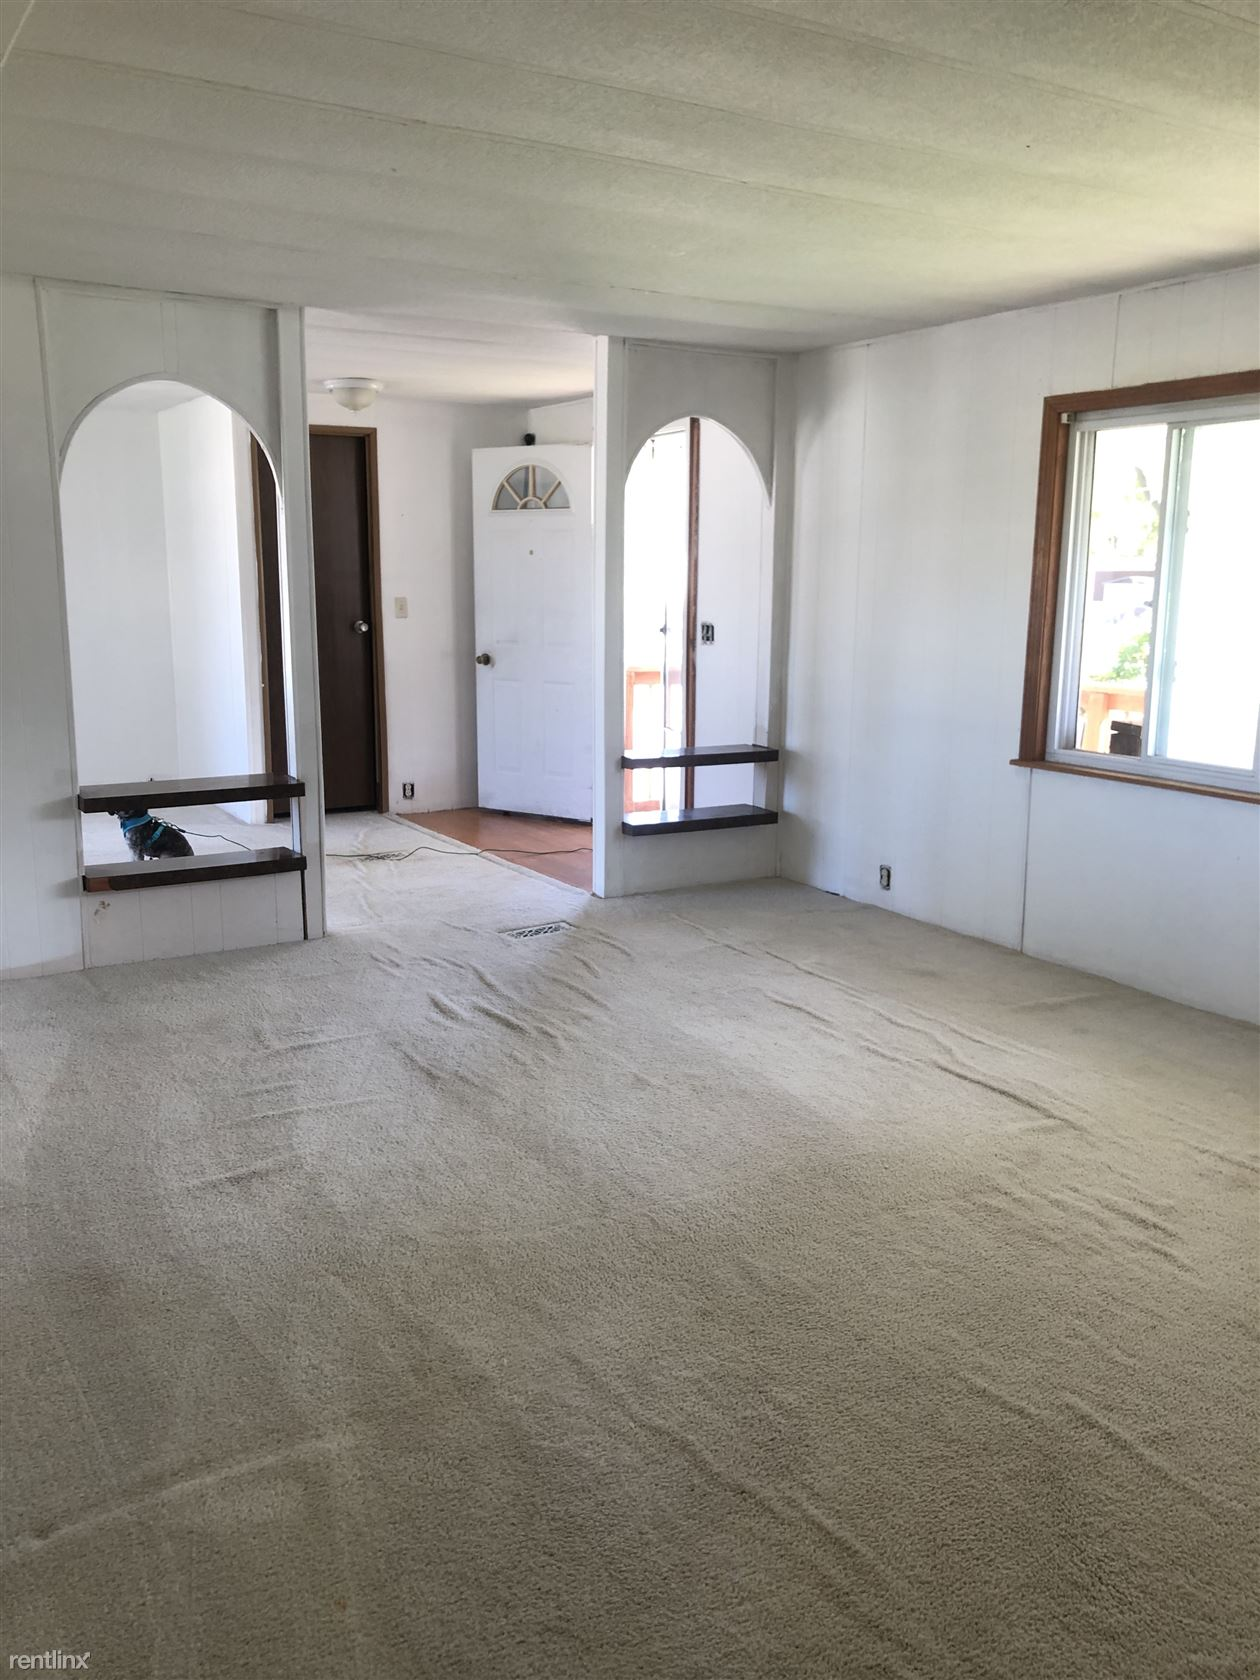 Apartment for Rent in Mount Morris